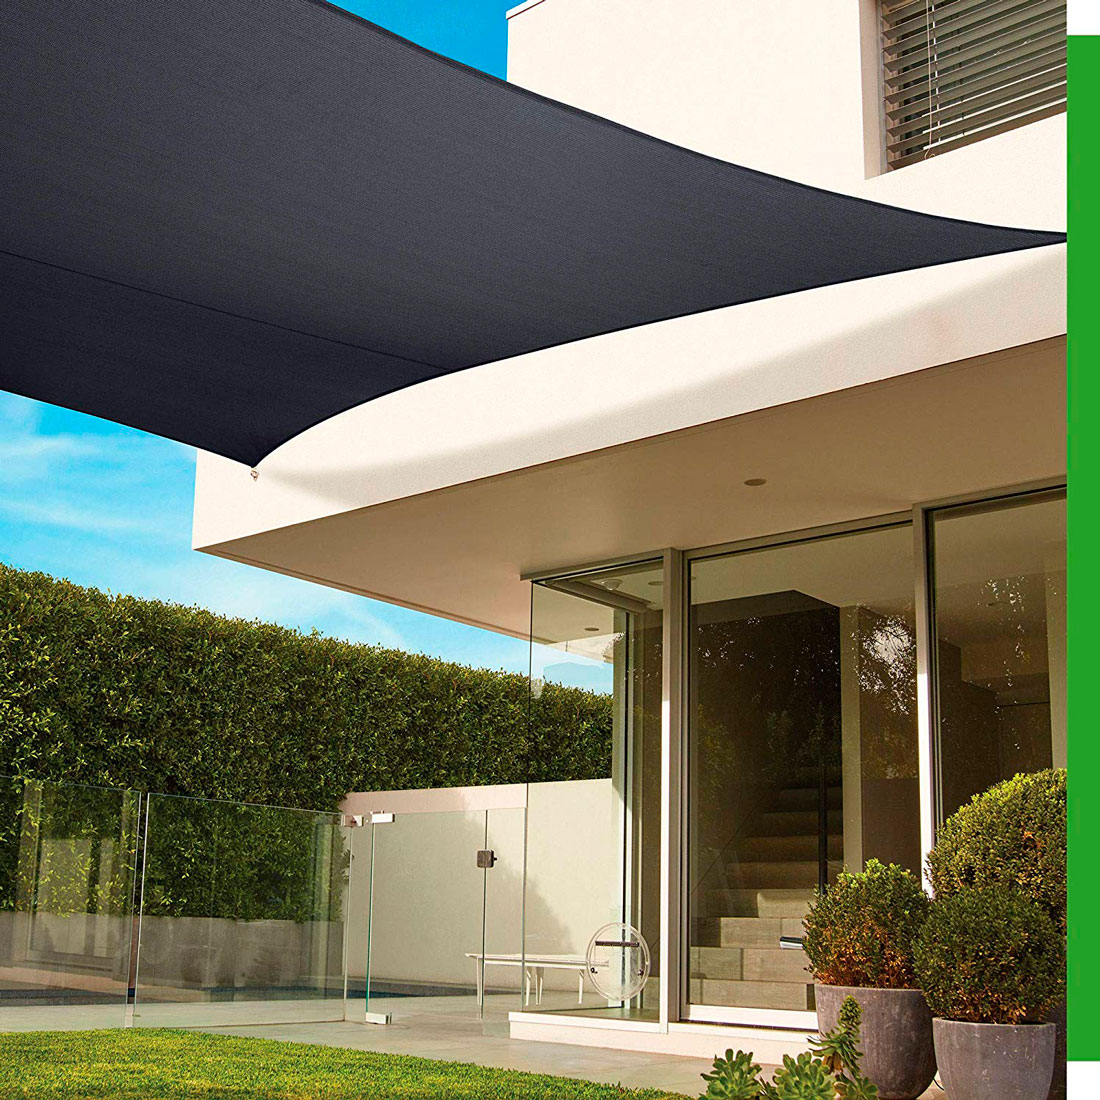 Tela Toldo Sombreamento Shade Prata Retangular 2x2m